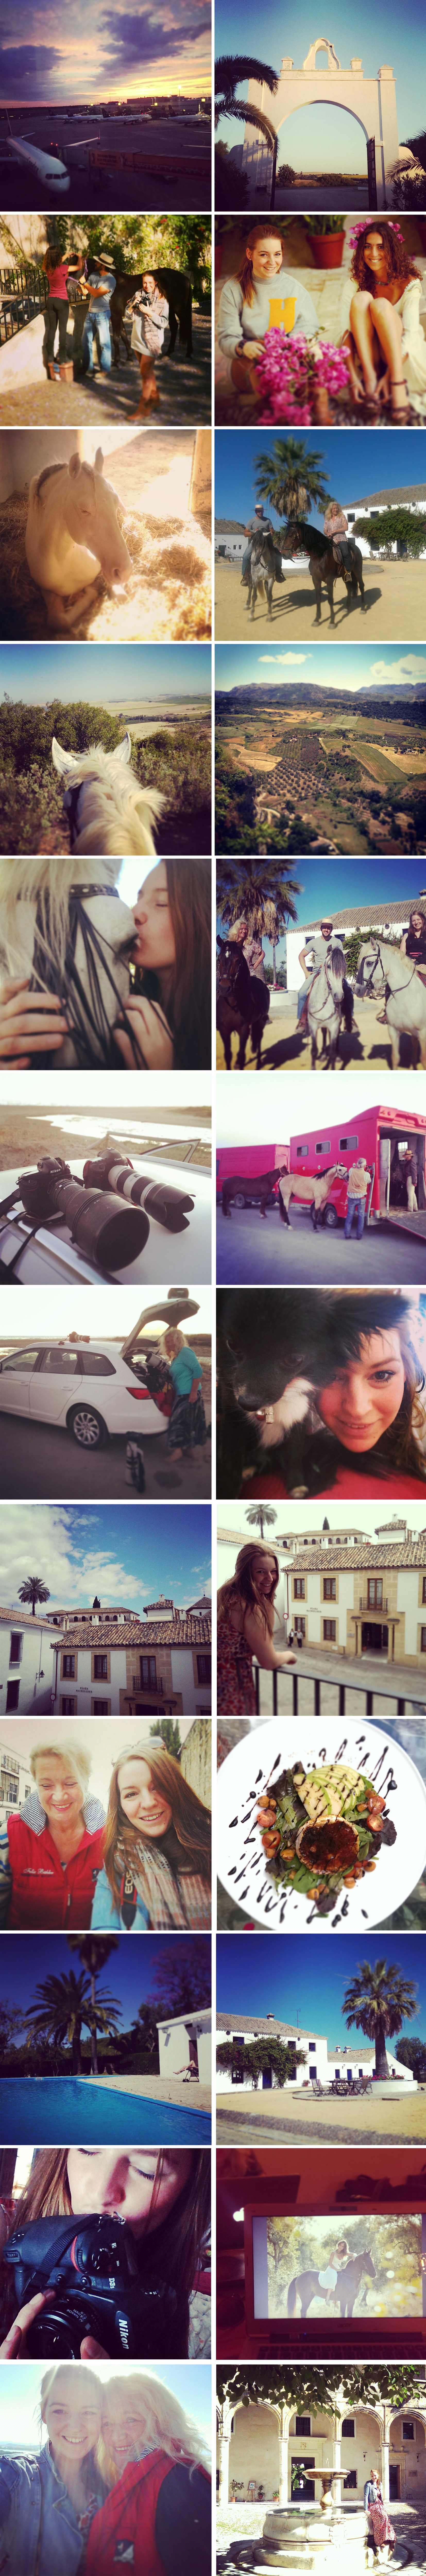 instagramtagebuch-alexandraevang